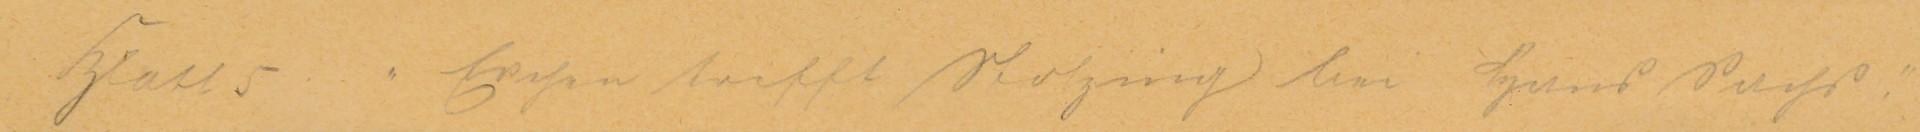 Lot 4010173: 3 Ferdinand Staeger Etchings from The Mastersingers of Nuremberg